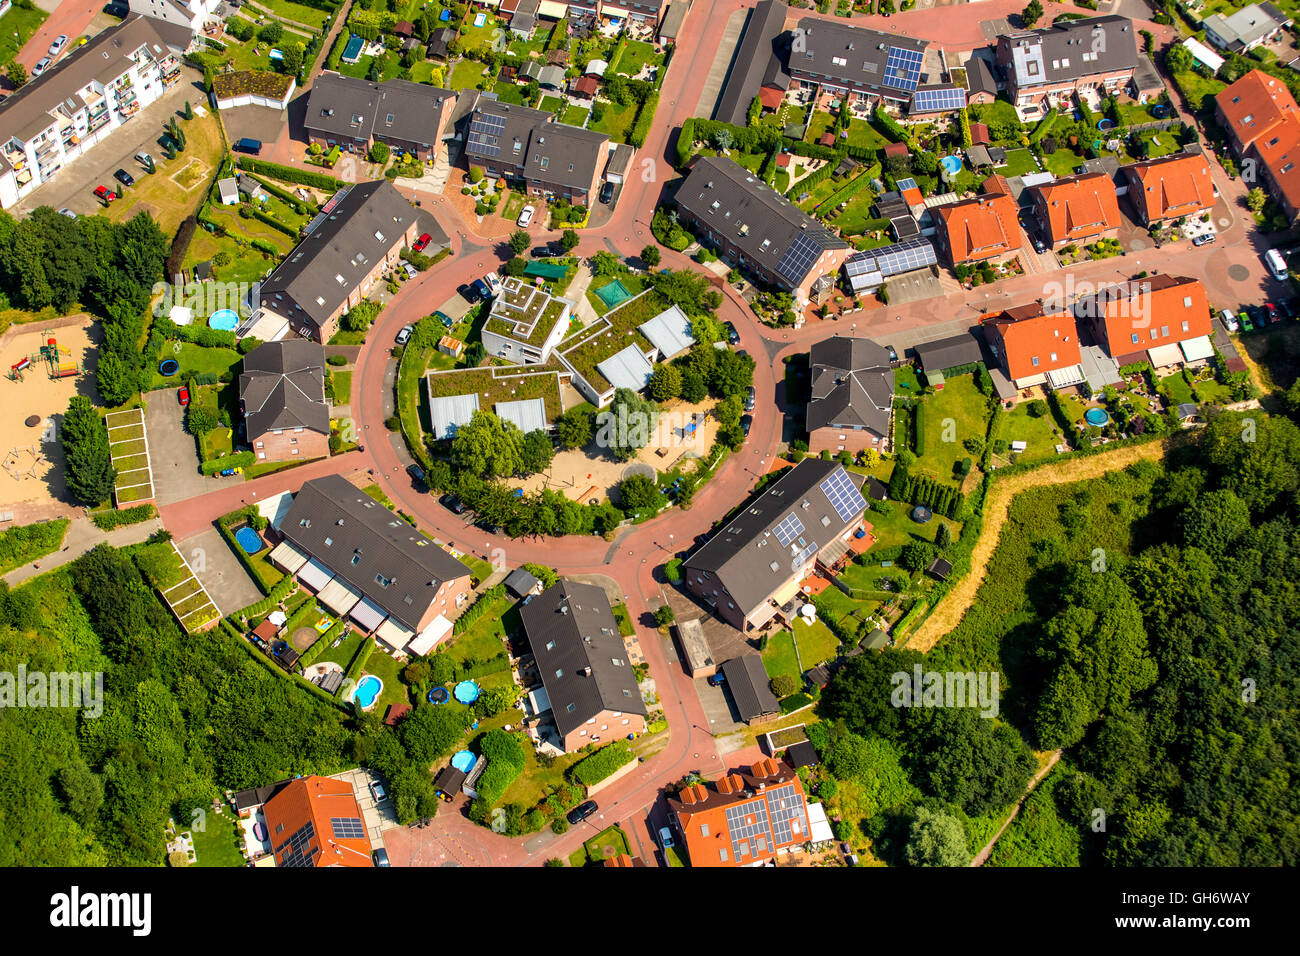 Luftaufnahme, Städt. Der Kindergarten Boy, Häuser Kreis, kreisförmige Siedlung im Johannestal 86, Stockbild